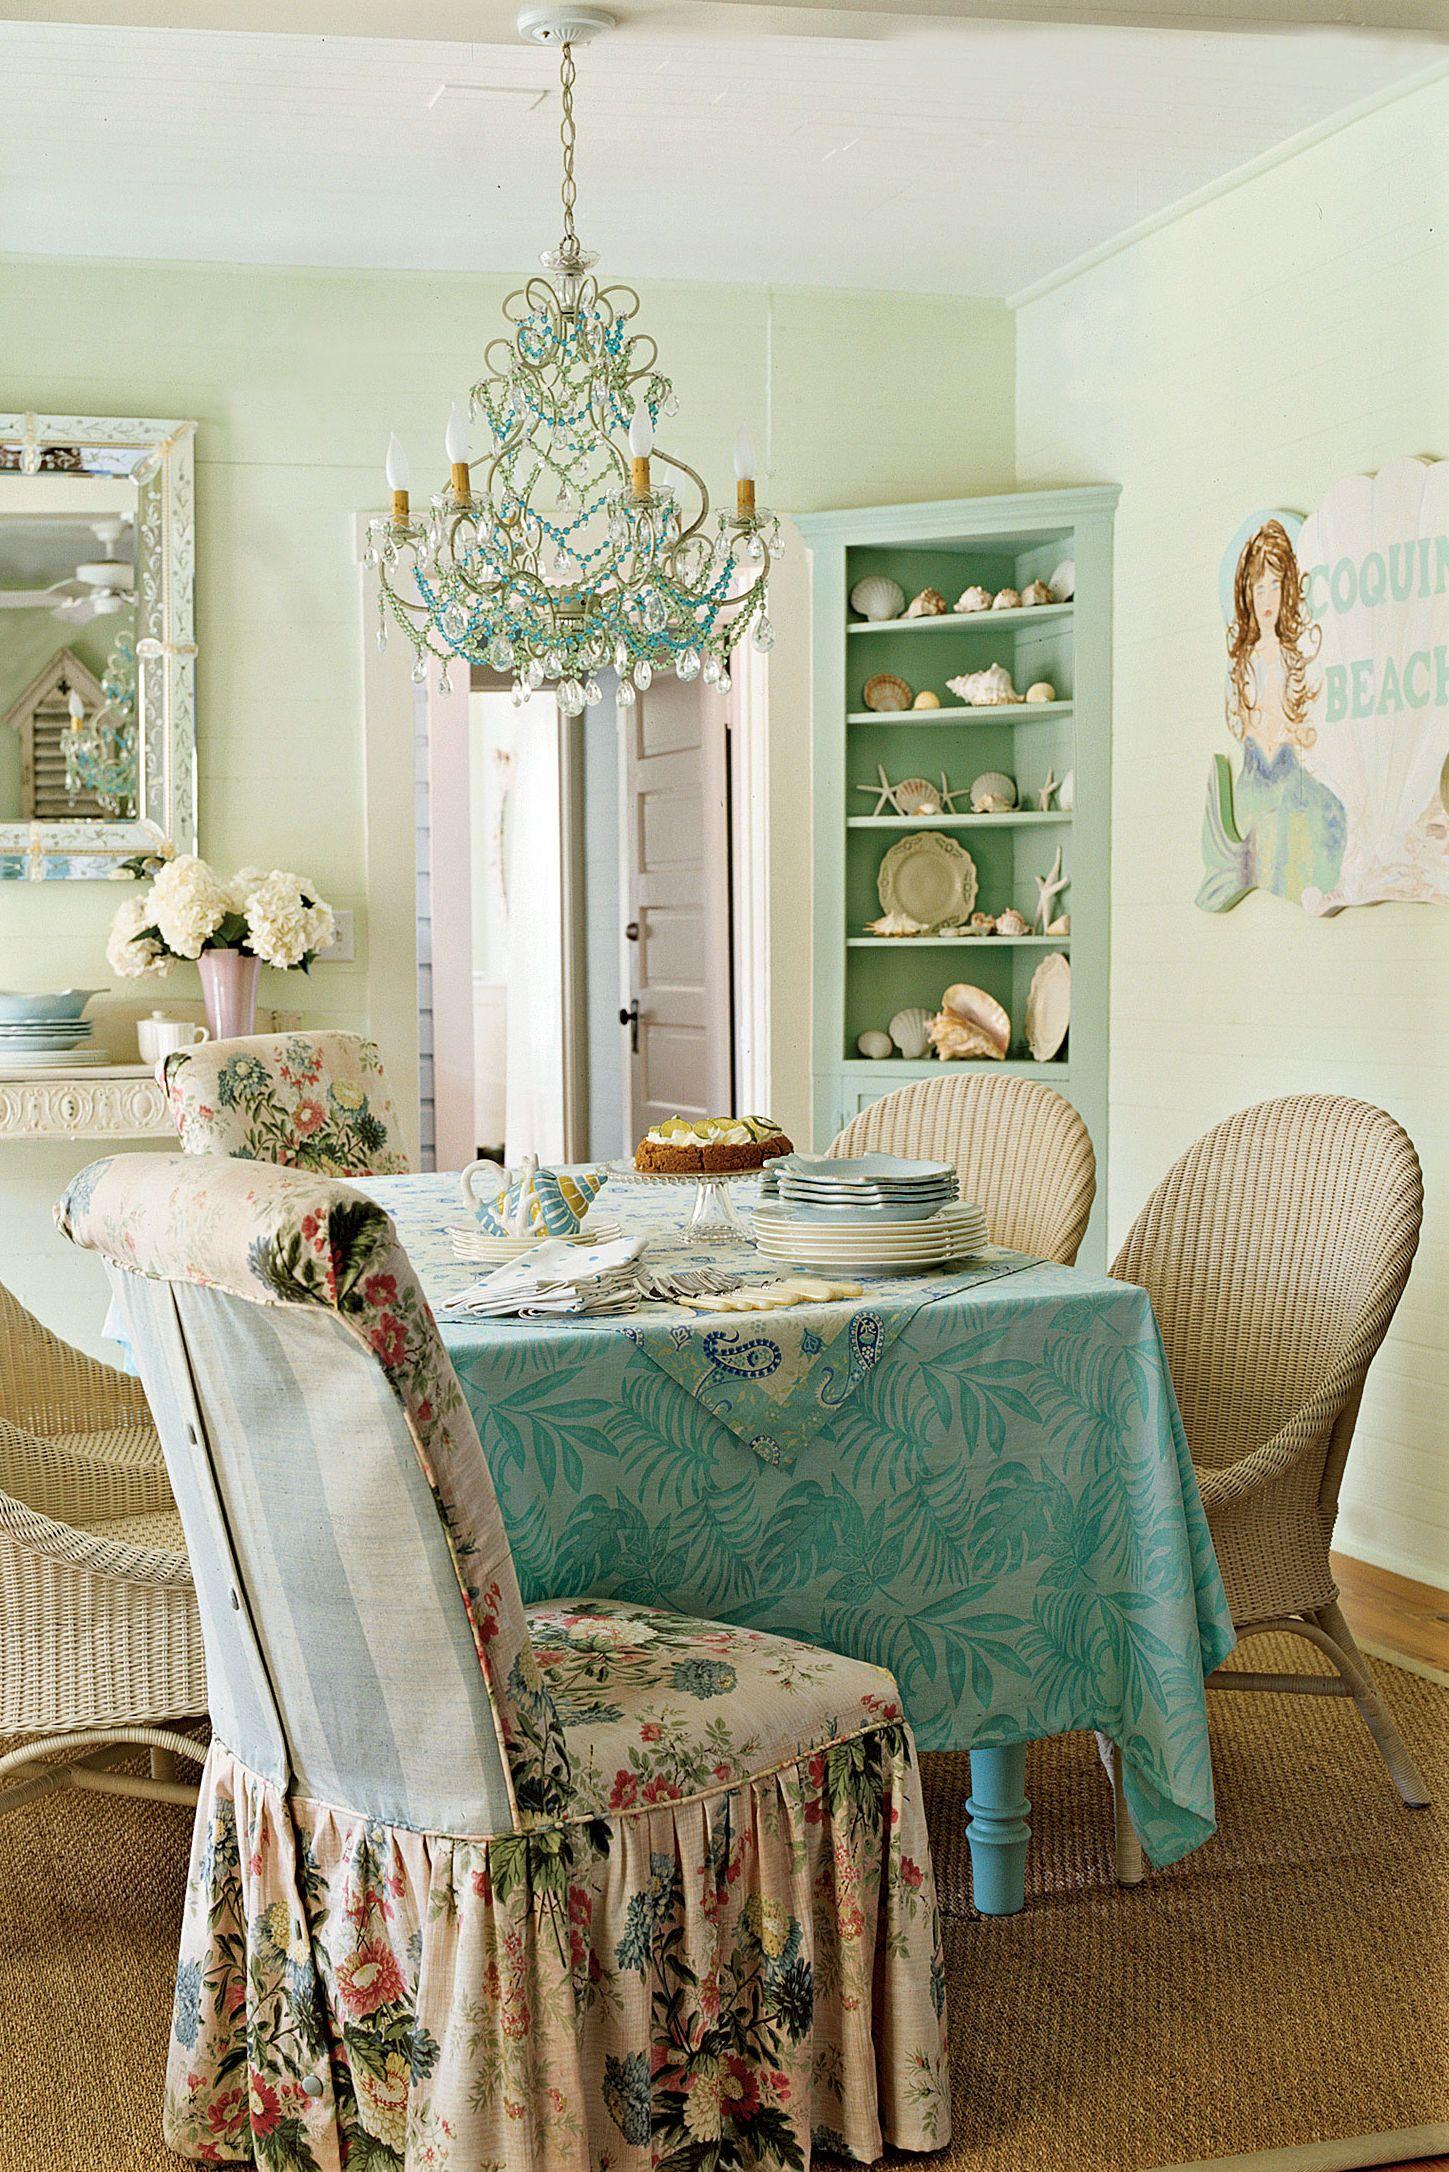 Our Alltime Favorite Green Rooms Salle à manger shabby